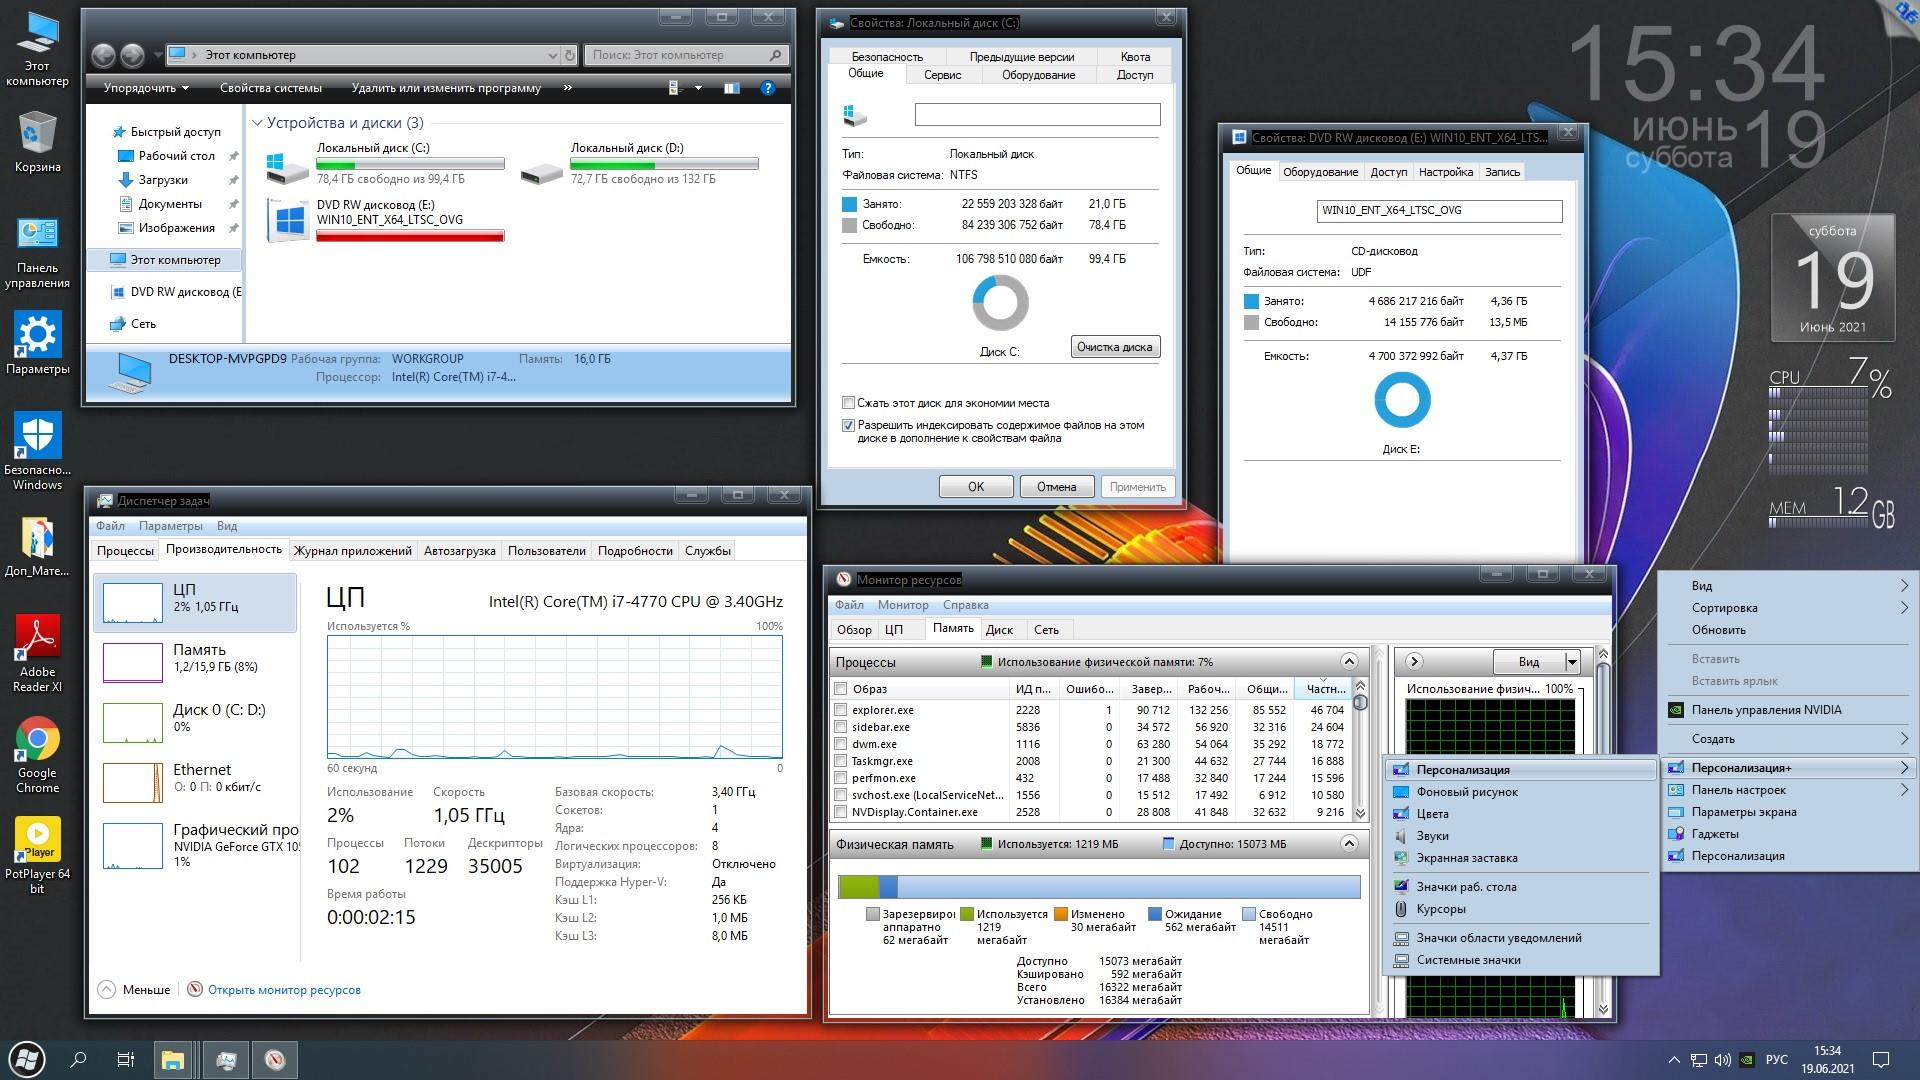 Windows 10 Enterprise LTSC 2019 x86-x64 1809 RU by OVGorskiy 06.2021 2DVD